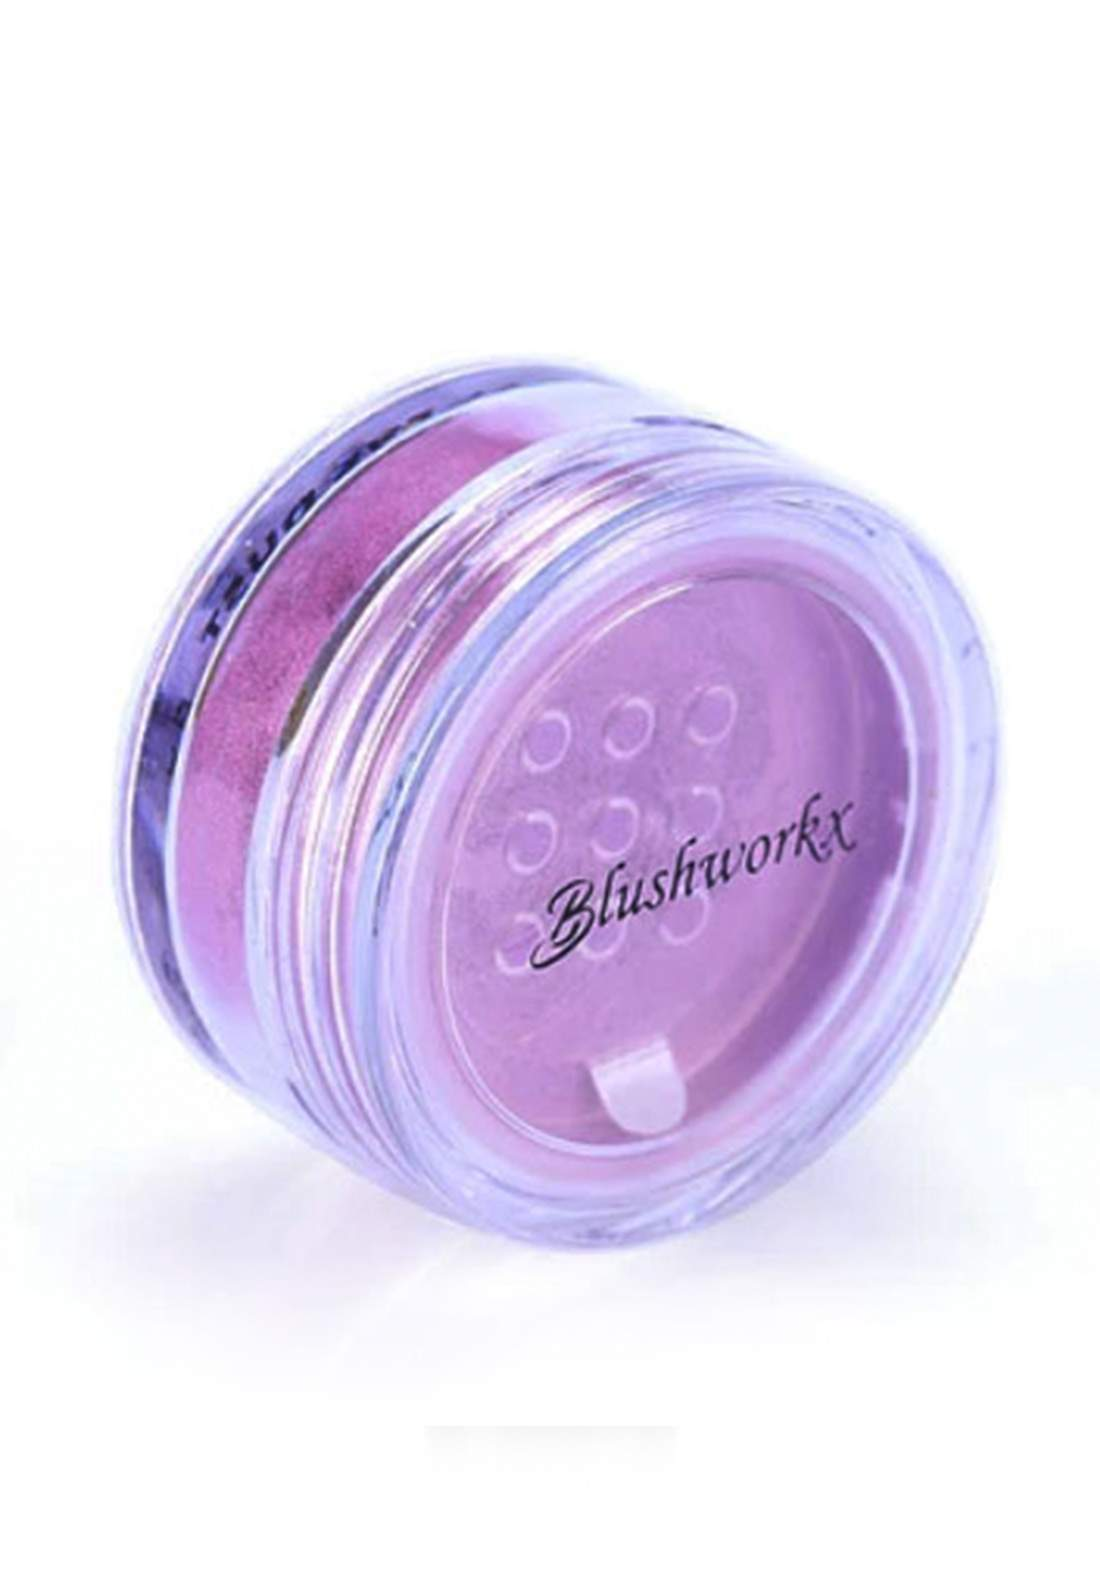 Blushworkx Hollywood Mineral Eye Dust No.32 Purple Pink   1.5g ظلال للعيون